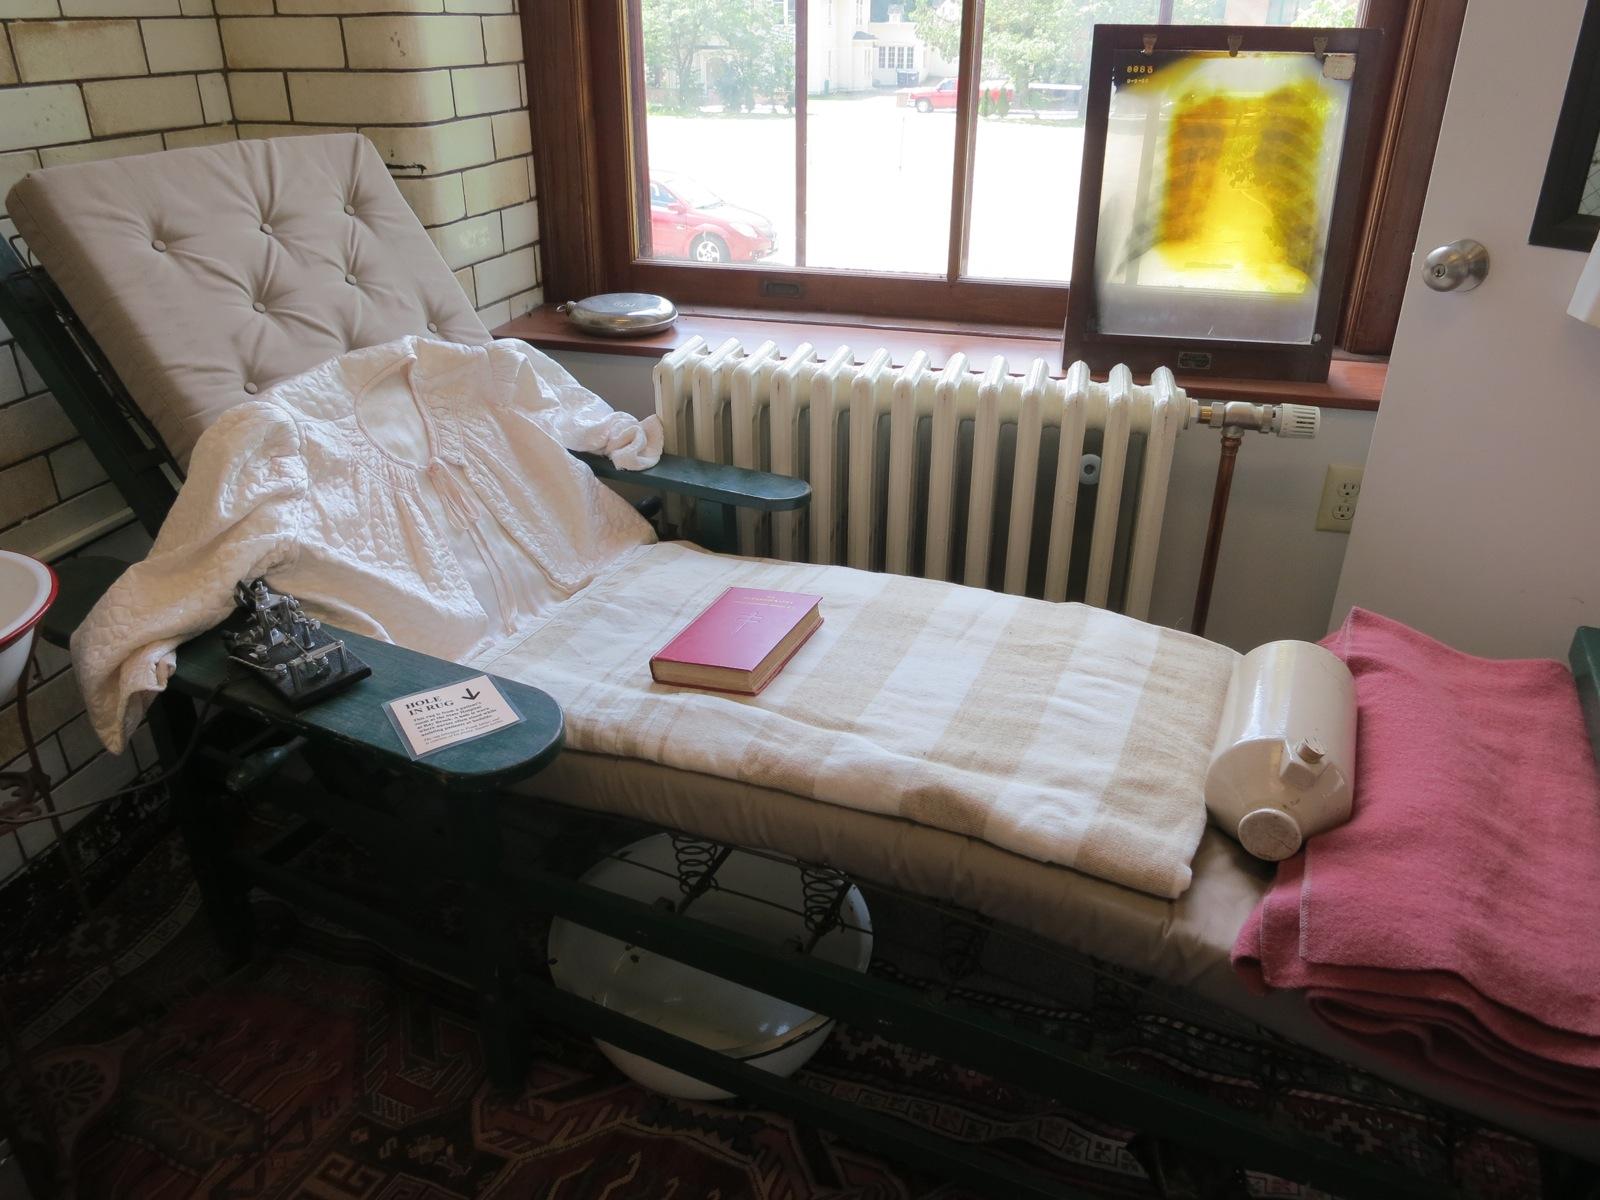 Cure Chair On Exhibit At The Historic Saranac Lake Laboratory, Saranac Lake,  NY